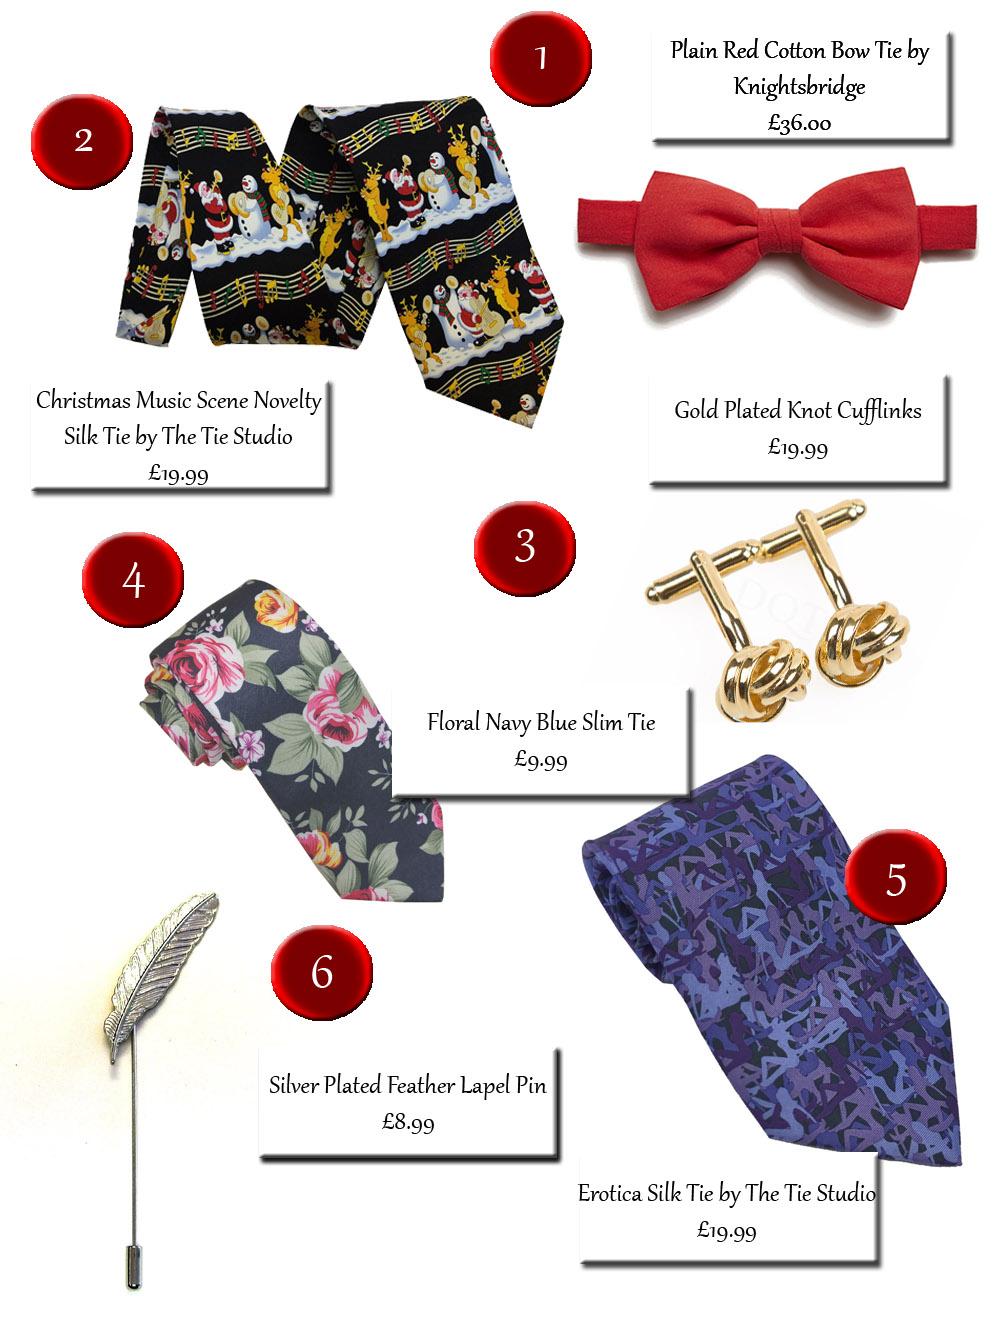 ca07b18b4db8 Plain Red Cotton Bow Tie by Knightsbridge £36.00